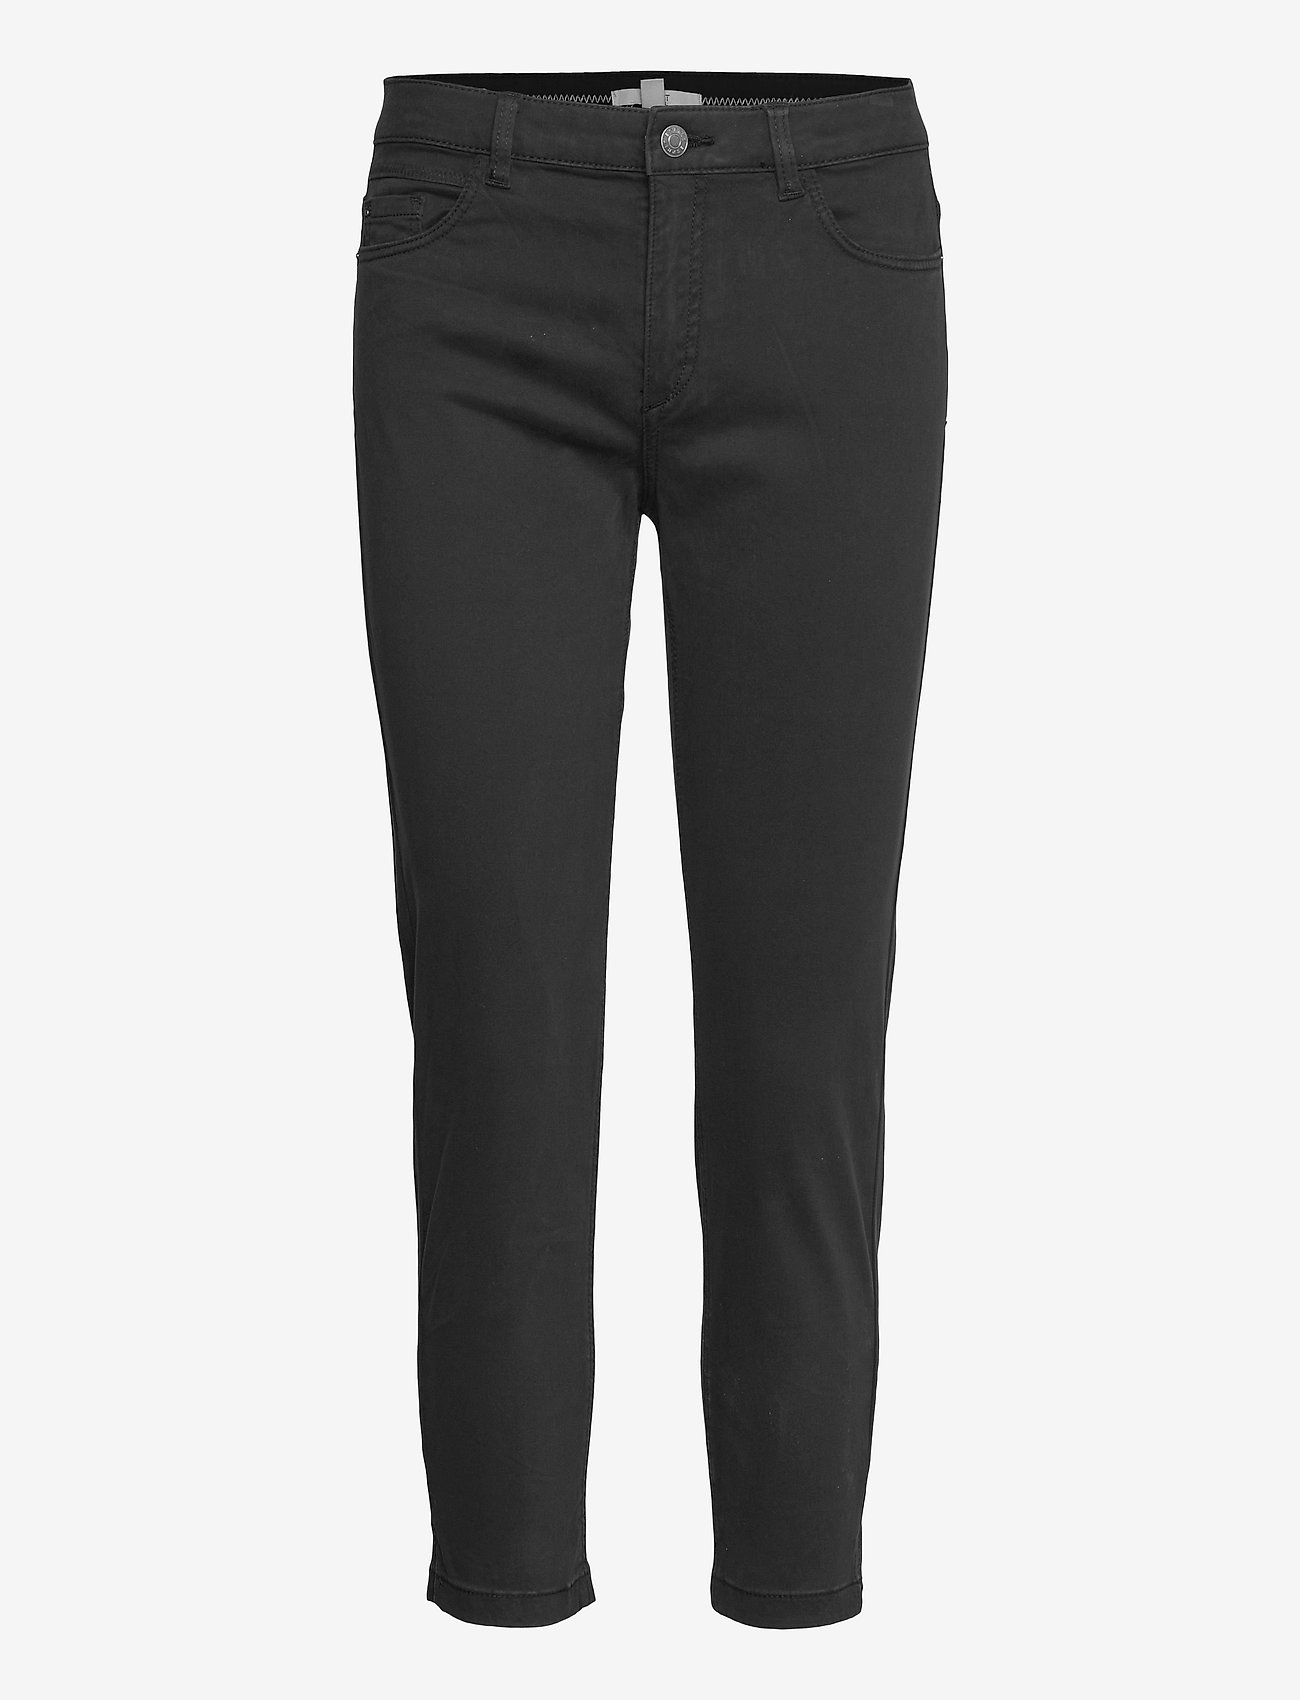 Esprit Casual - Pants woven - slim fit bukser - black - 0